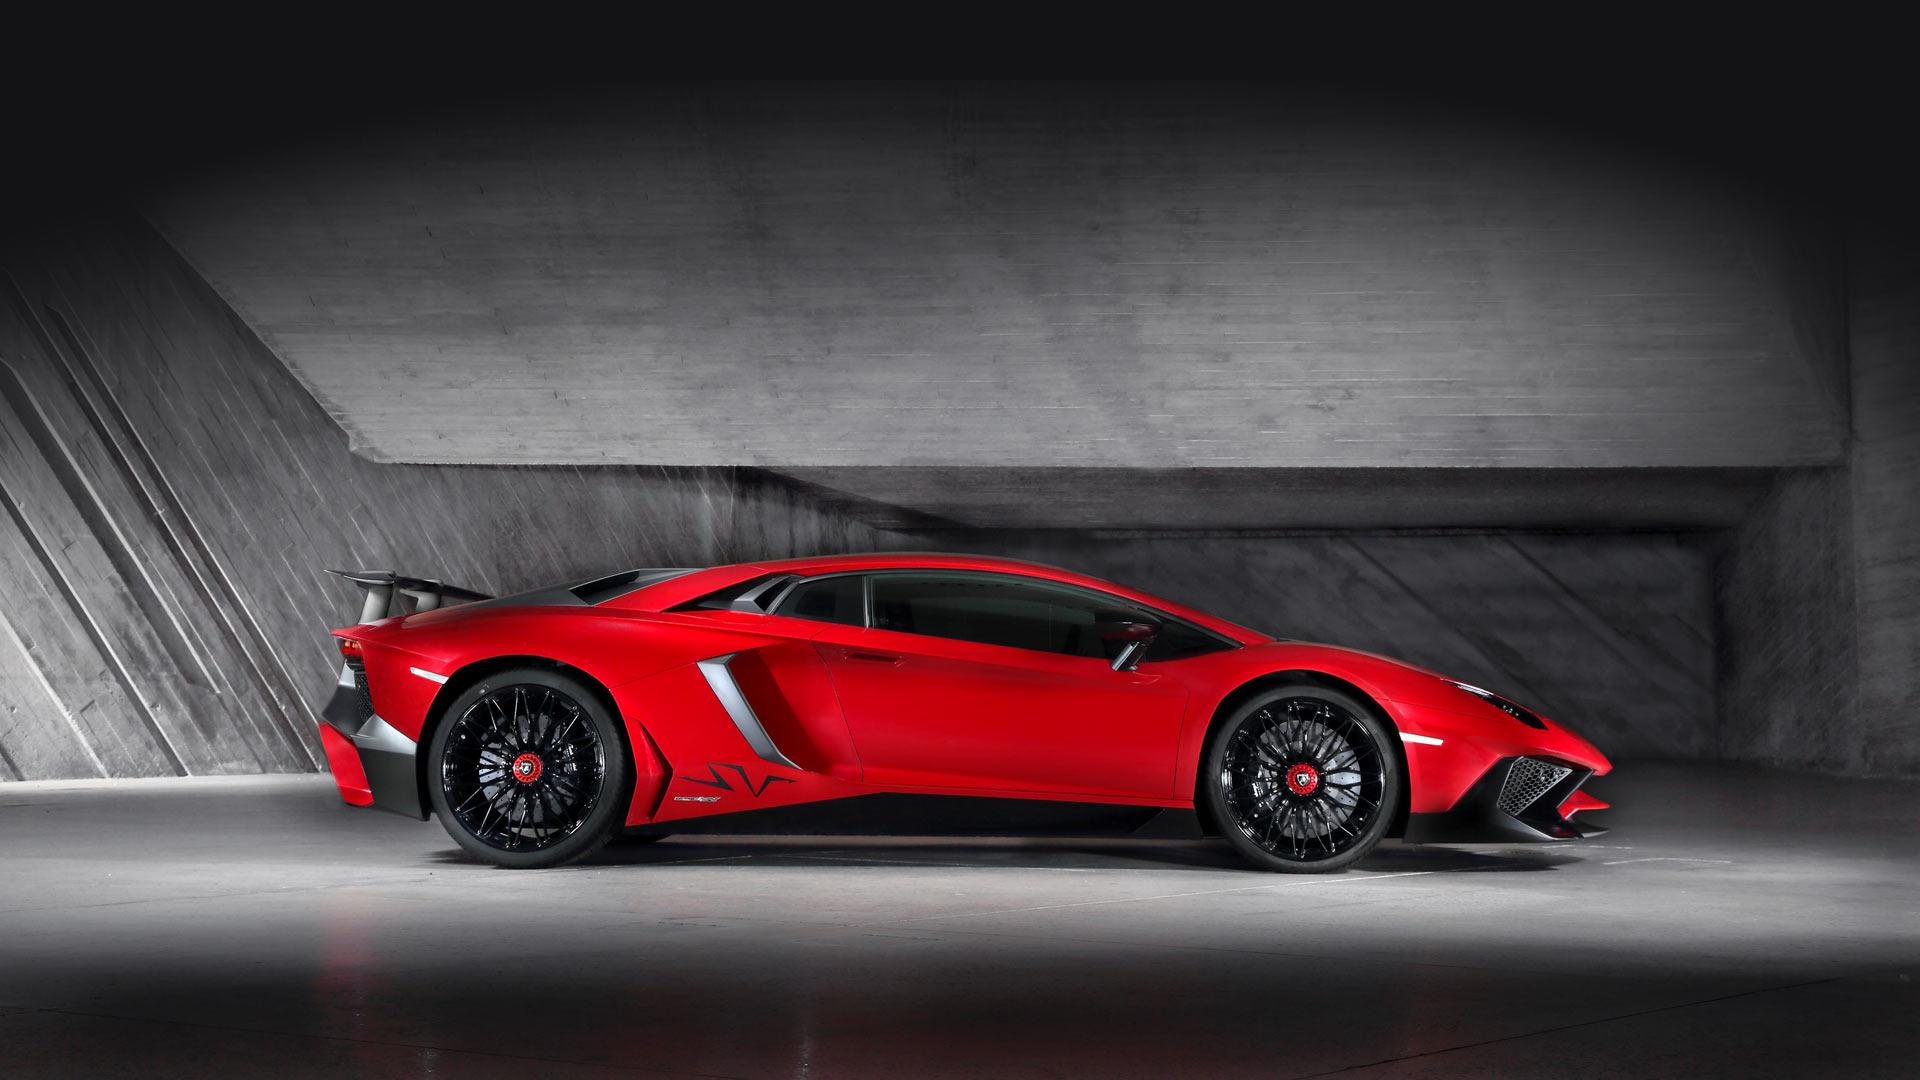 Lamborghini Aventador LP750-4 Superveloce_foto estudio